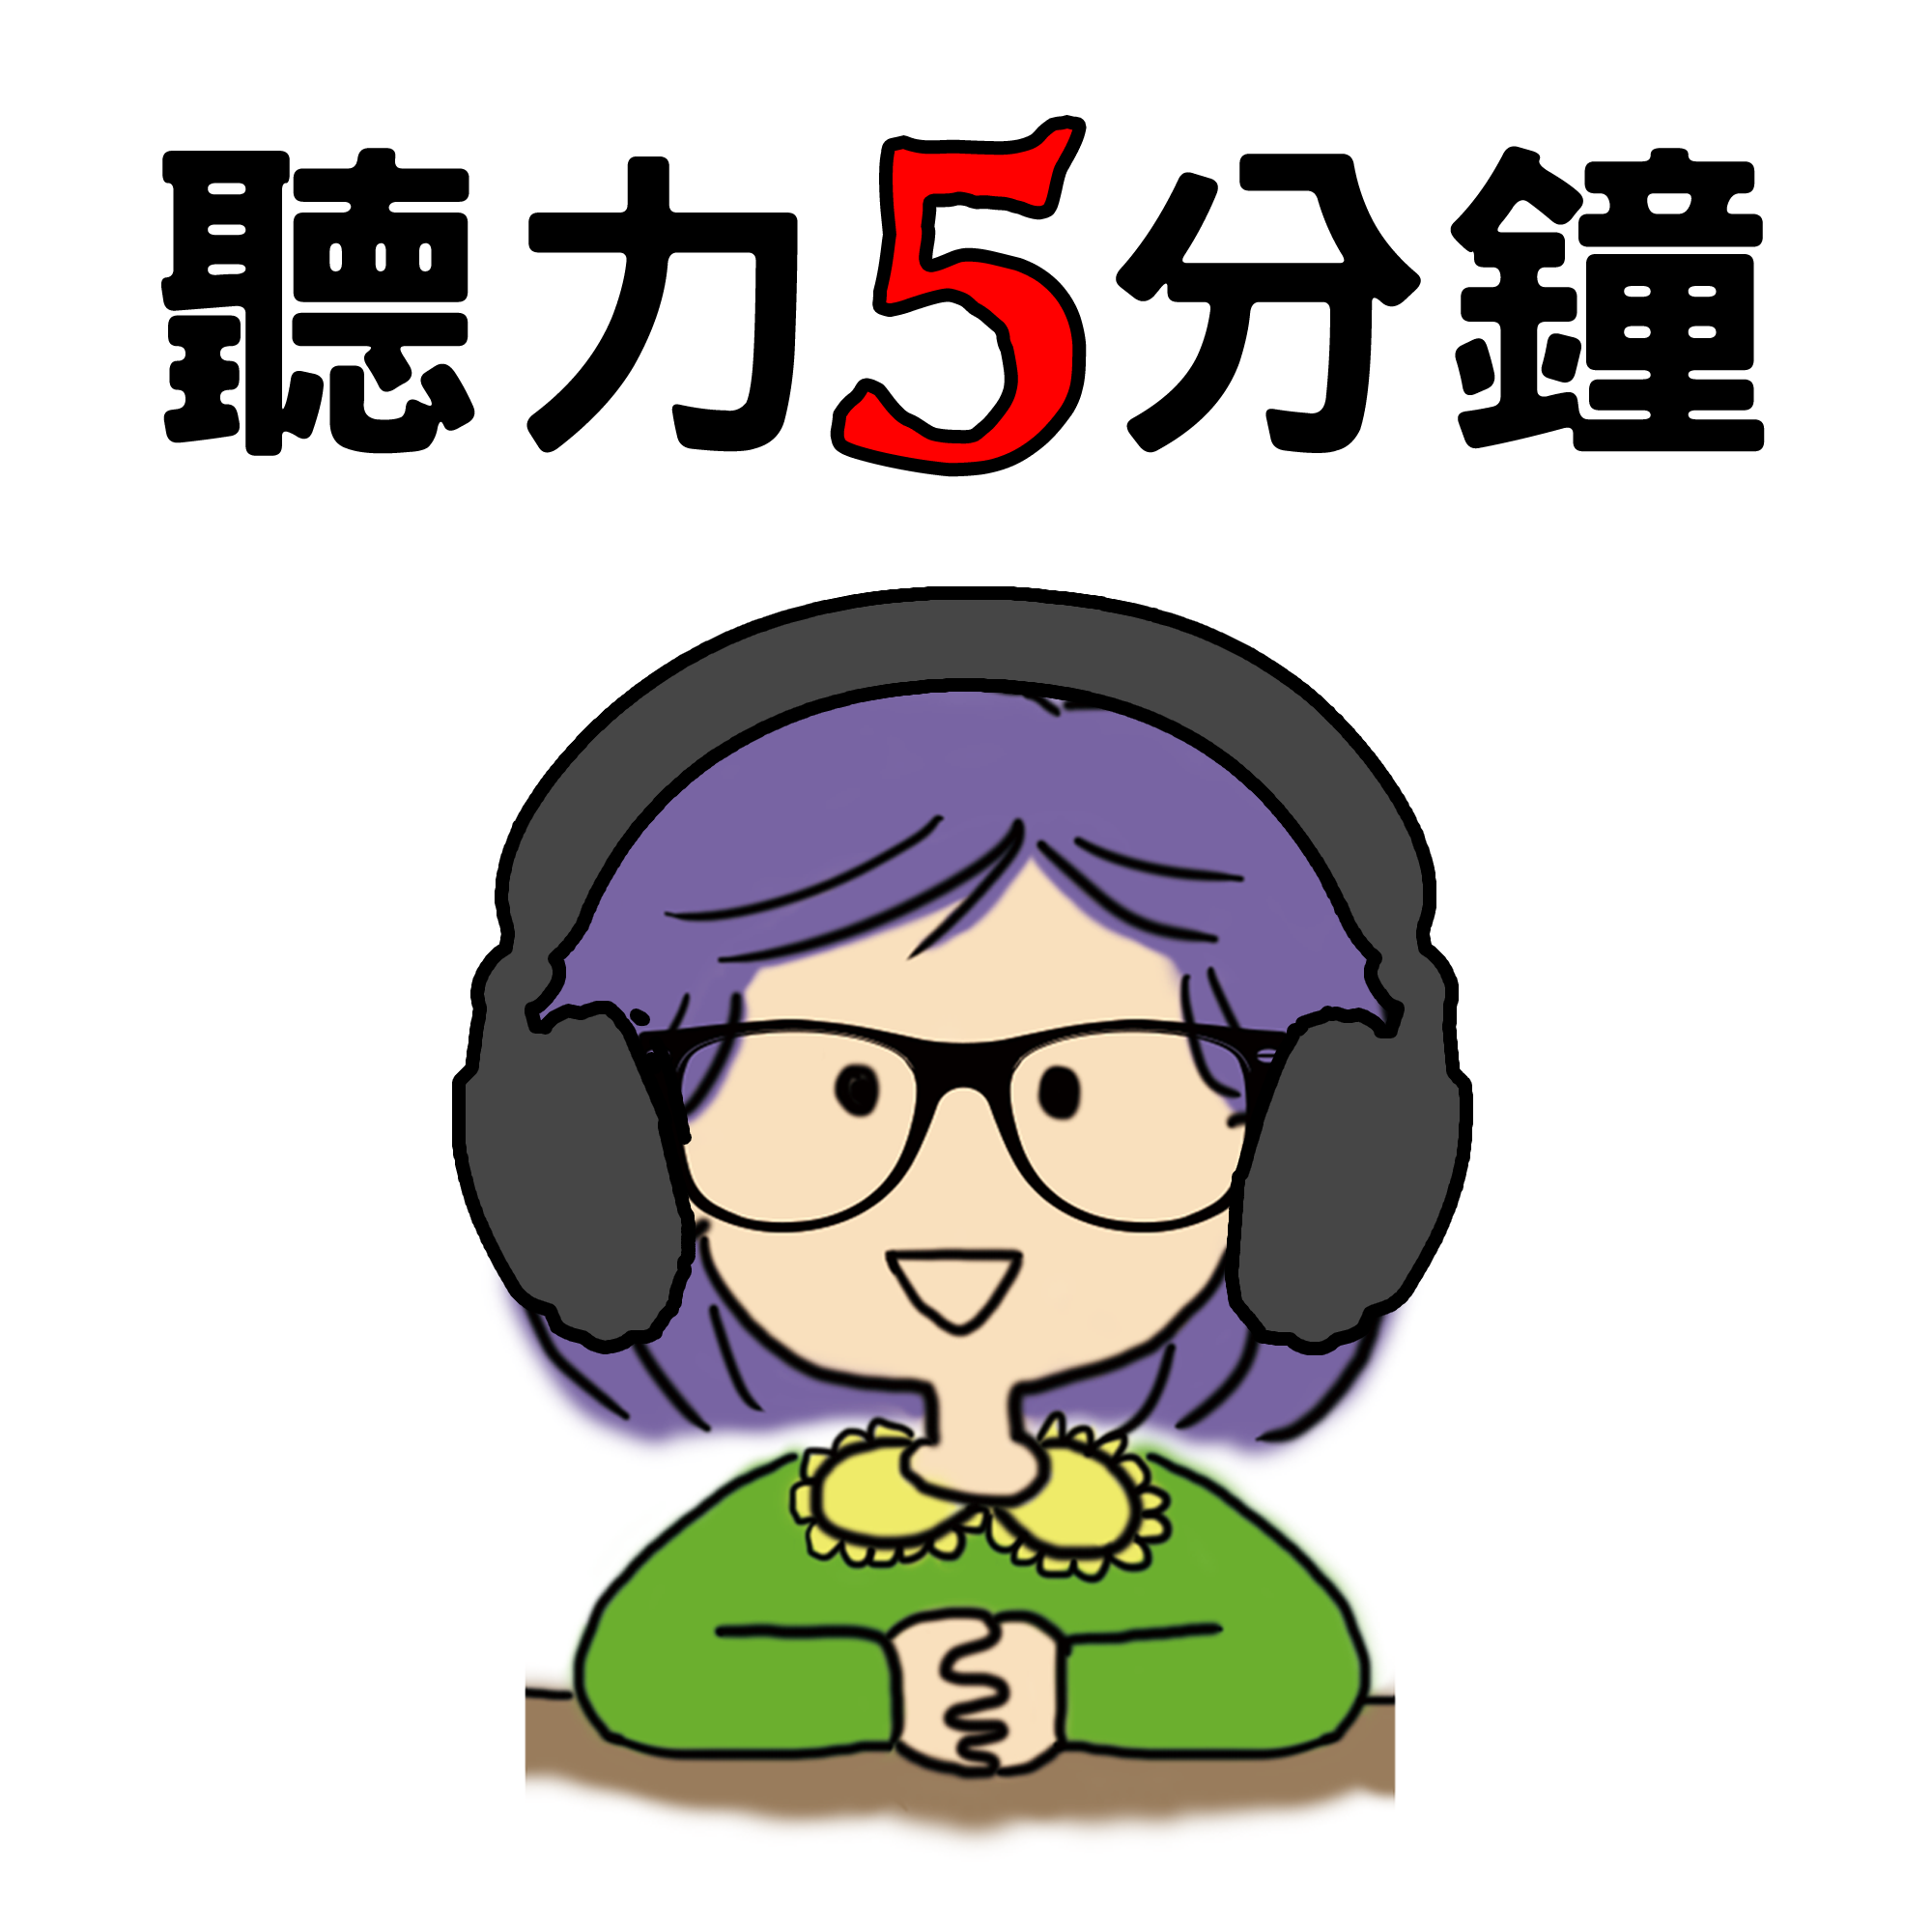 聽力5分鐘#3:應答 (Question-Response)